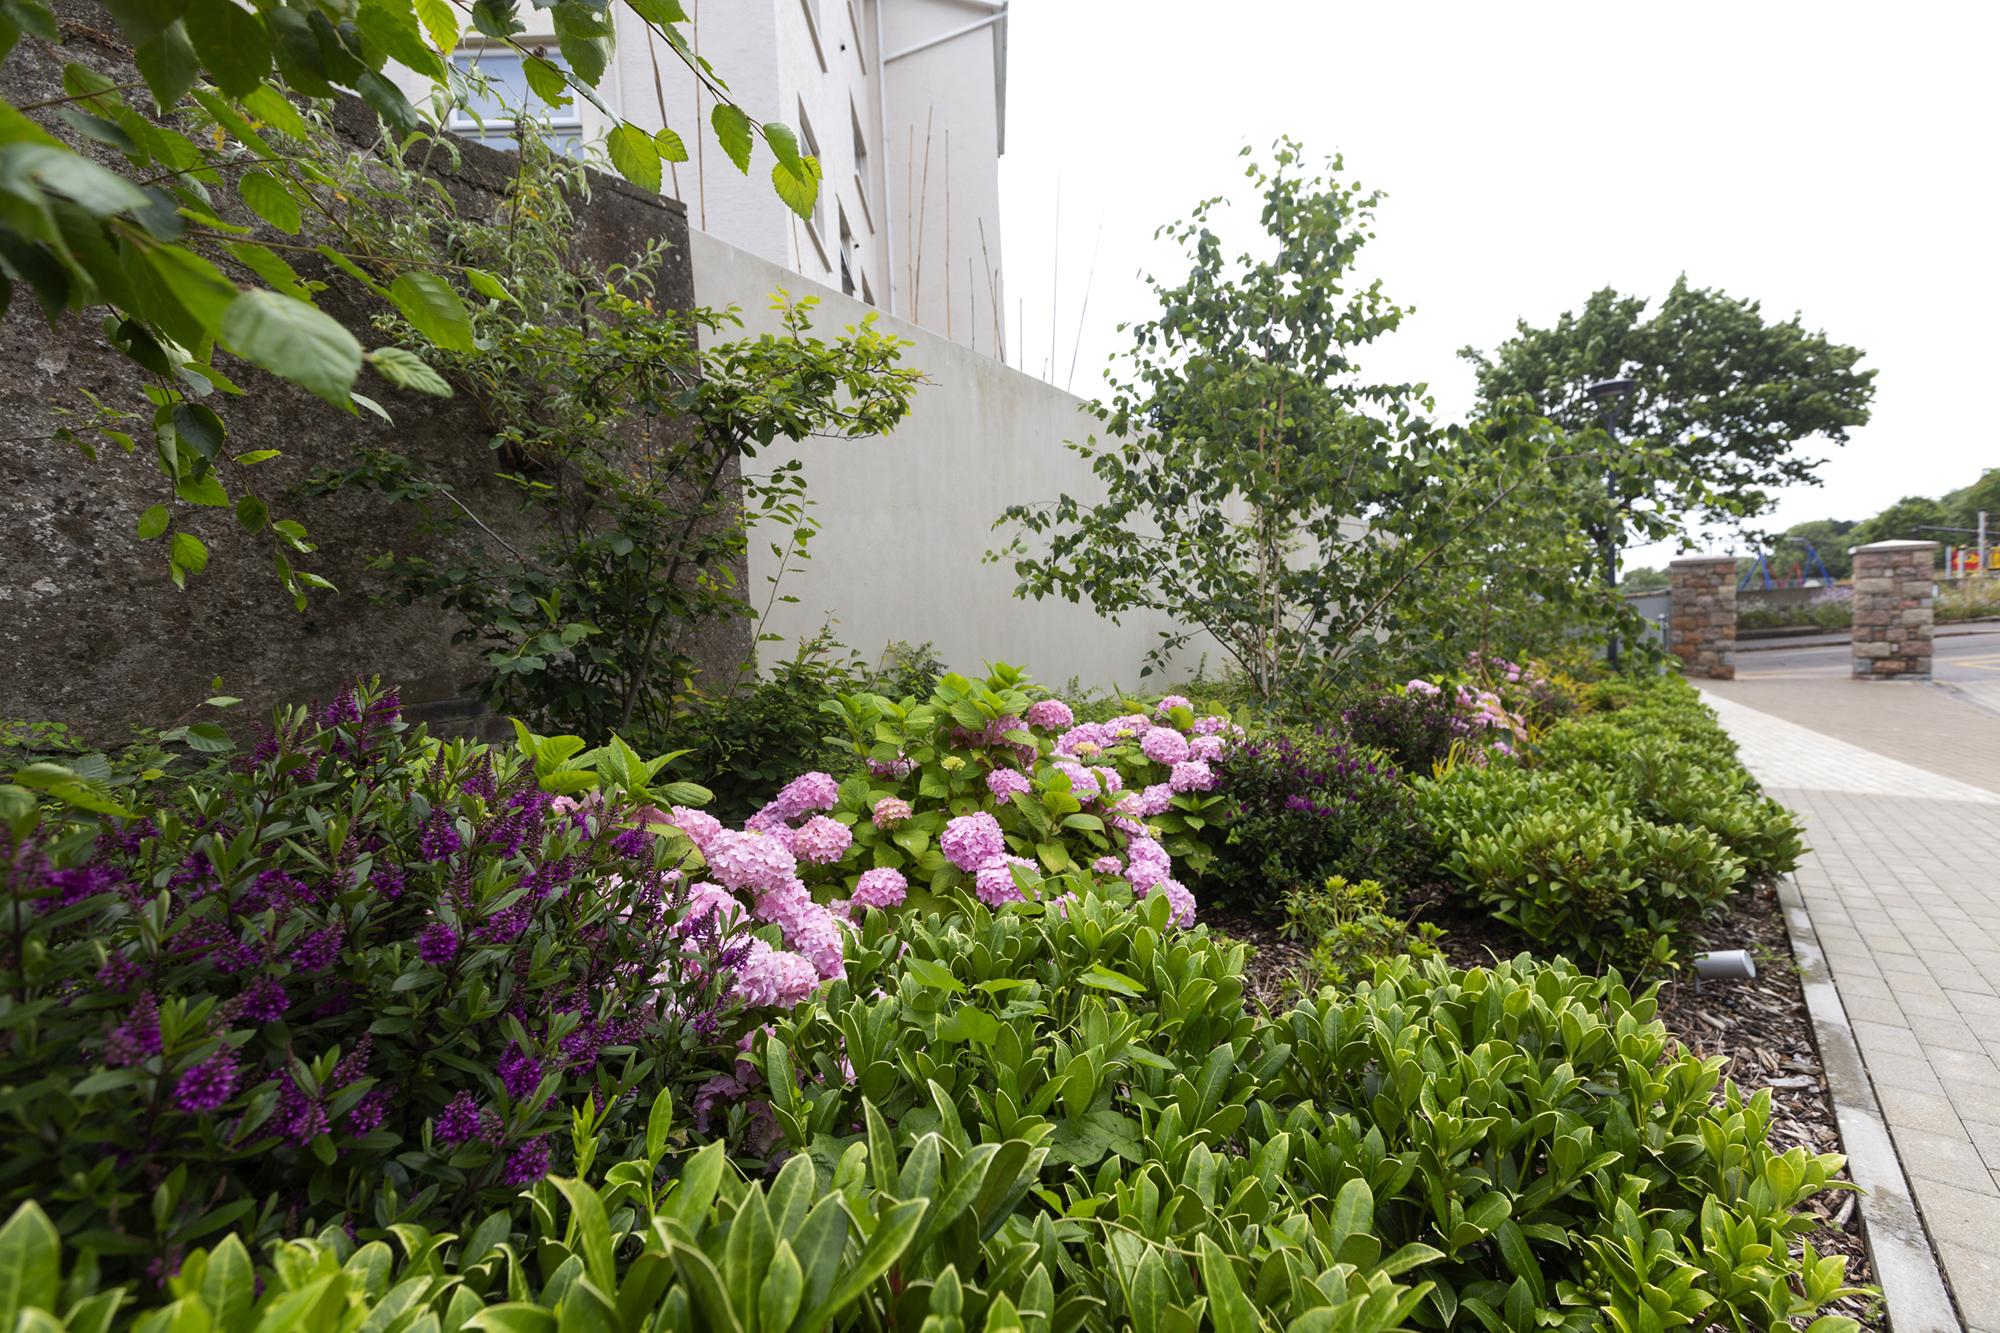 WESTMOUNT QUARRY LANDSCAPE | St. Helier, Jersey | Axis Mason